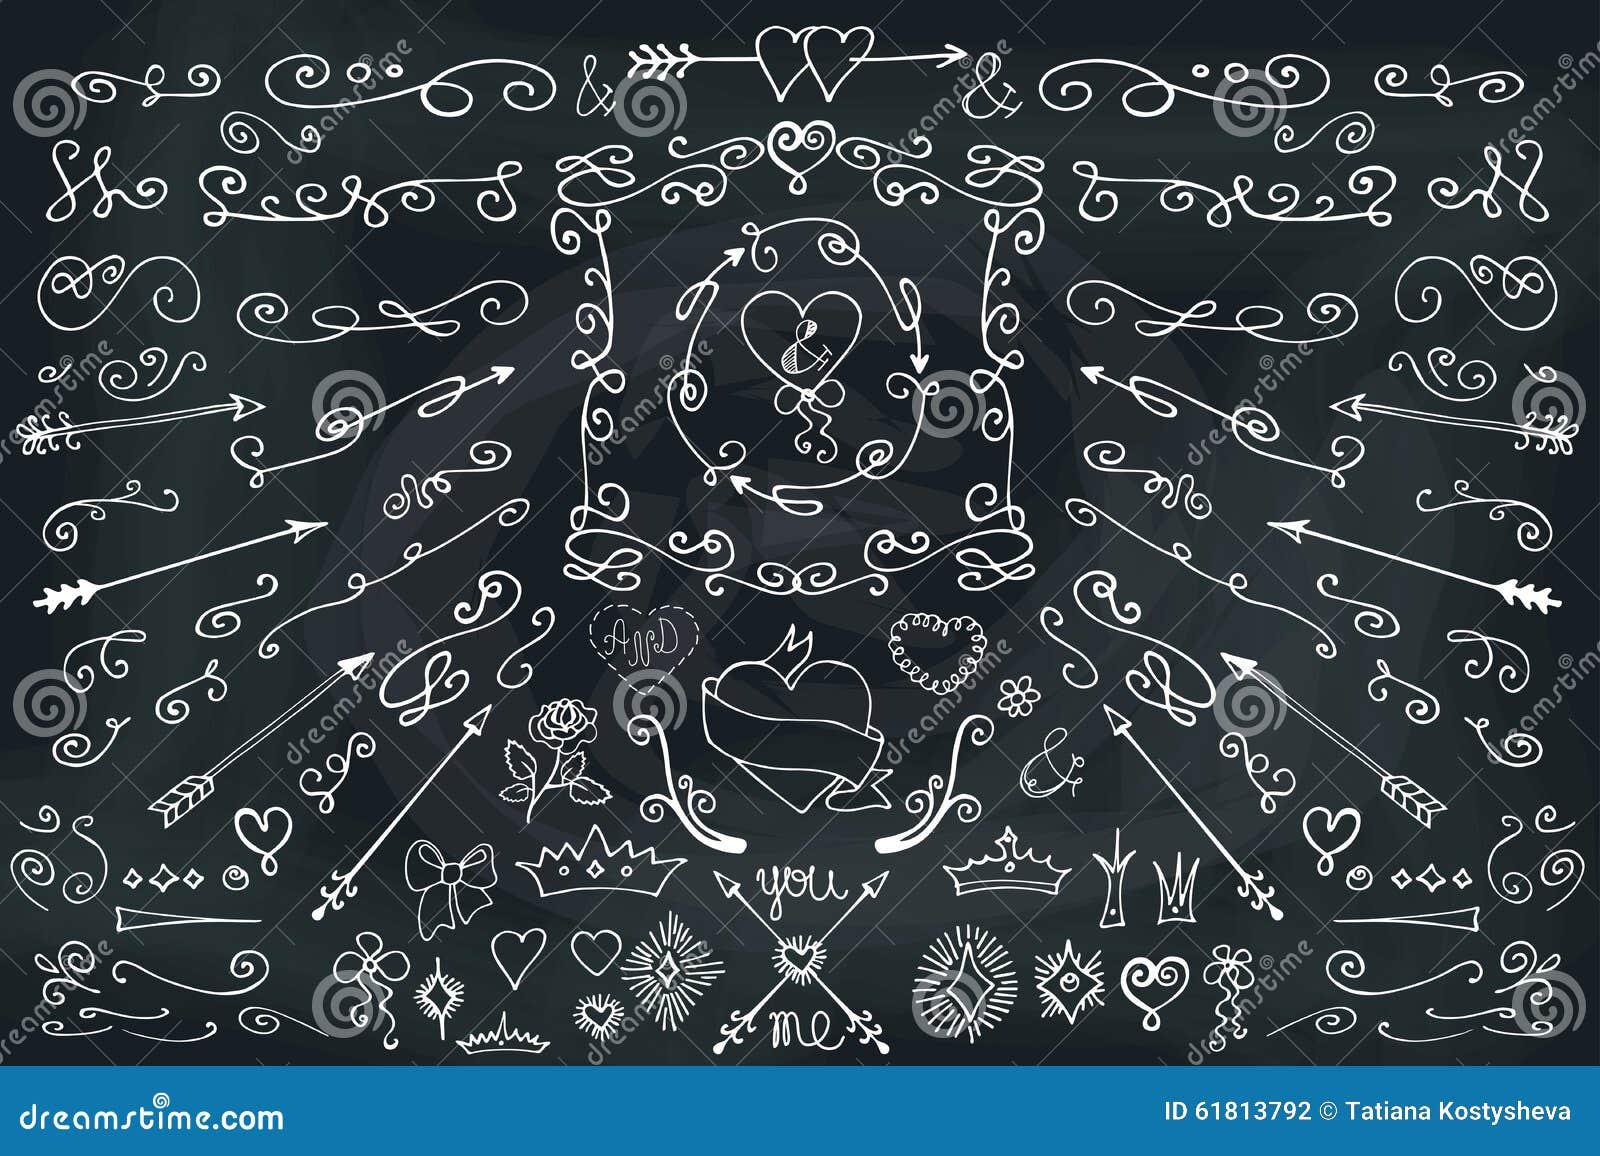 Tafel Tapete gekritzel pfeile dekorelement karikaturmuster für nette tapeten